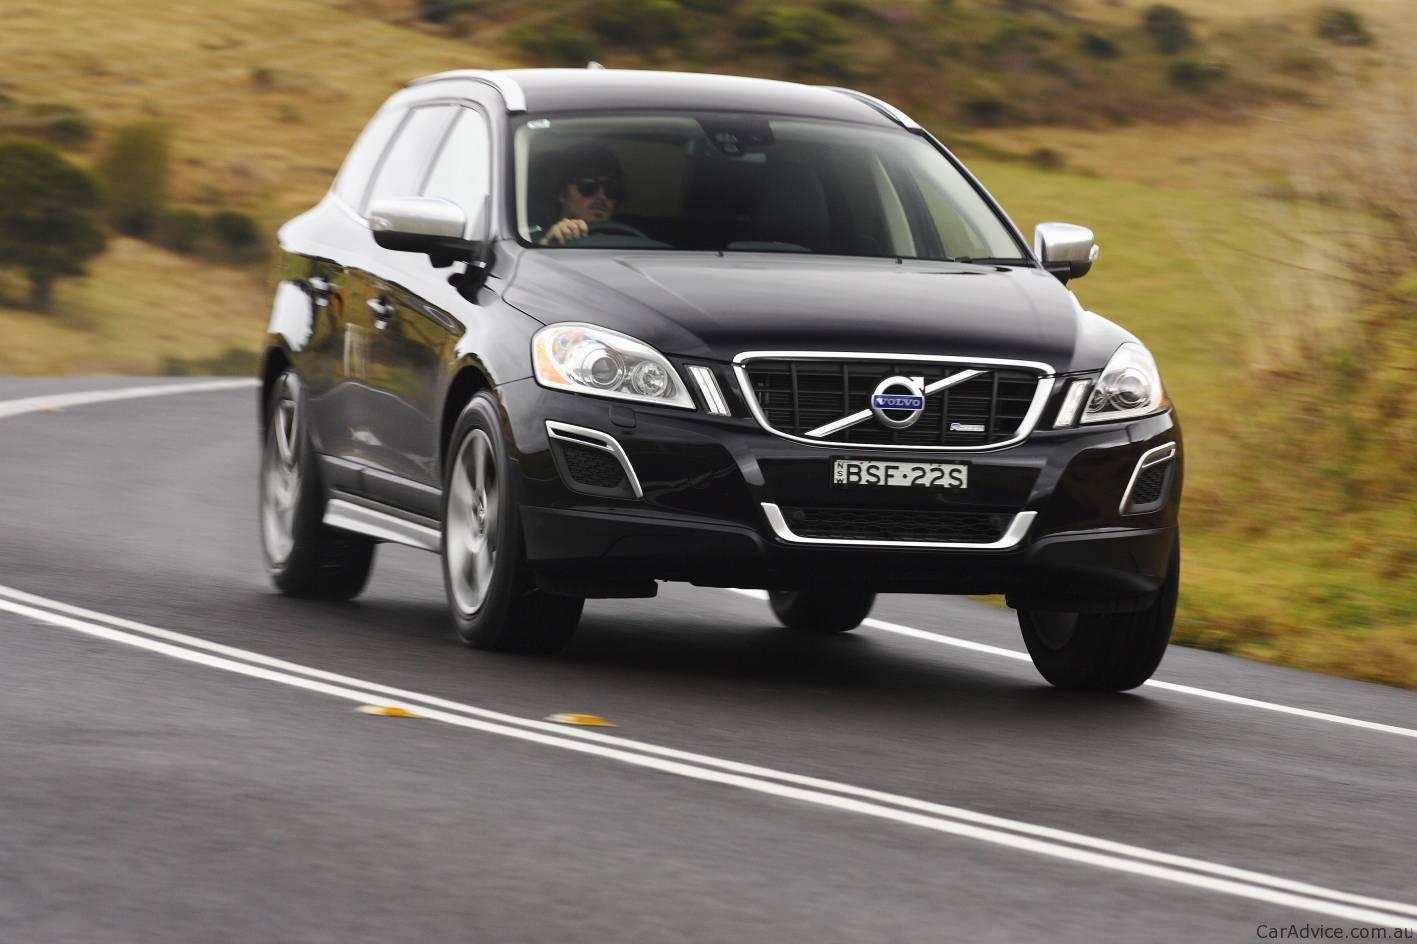 2012 Volvo XC60 update on sale in Australia - photos   CarAdvice